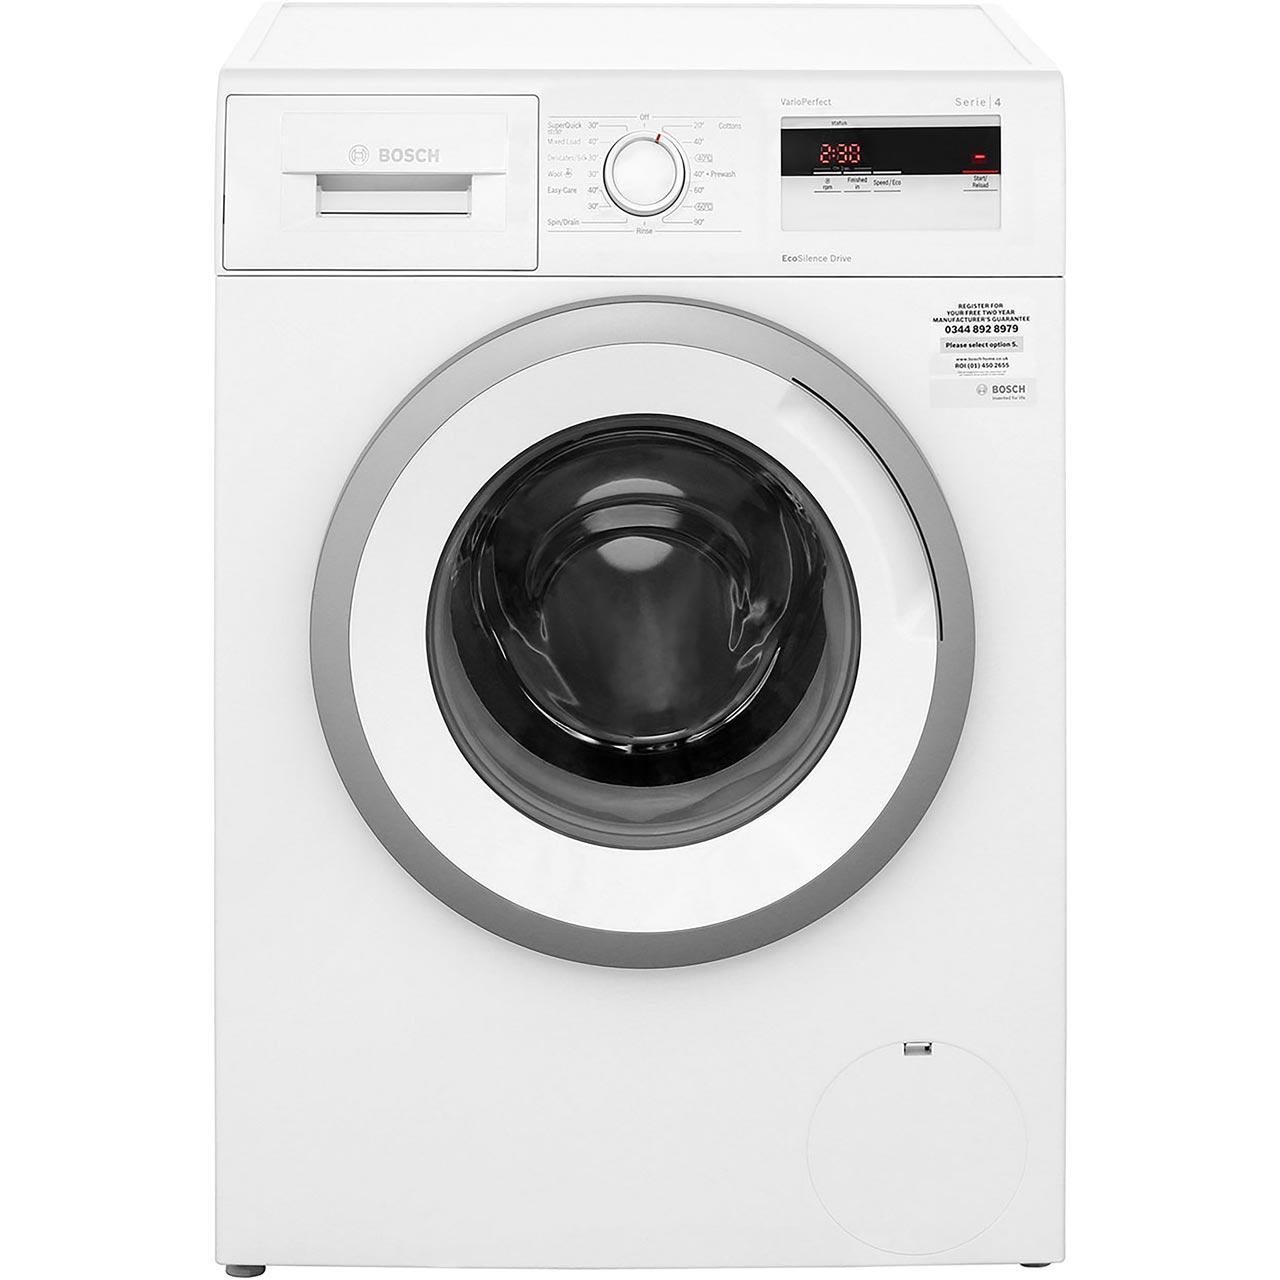 Bosch Serie 4 WAN28050GB 7Kg 1400rpm Washing Machine £339 w/ code (poss £328.53 + topcashback) @ AO.com